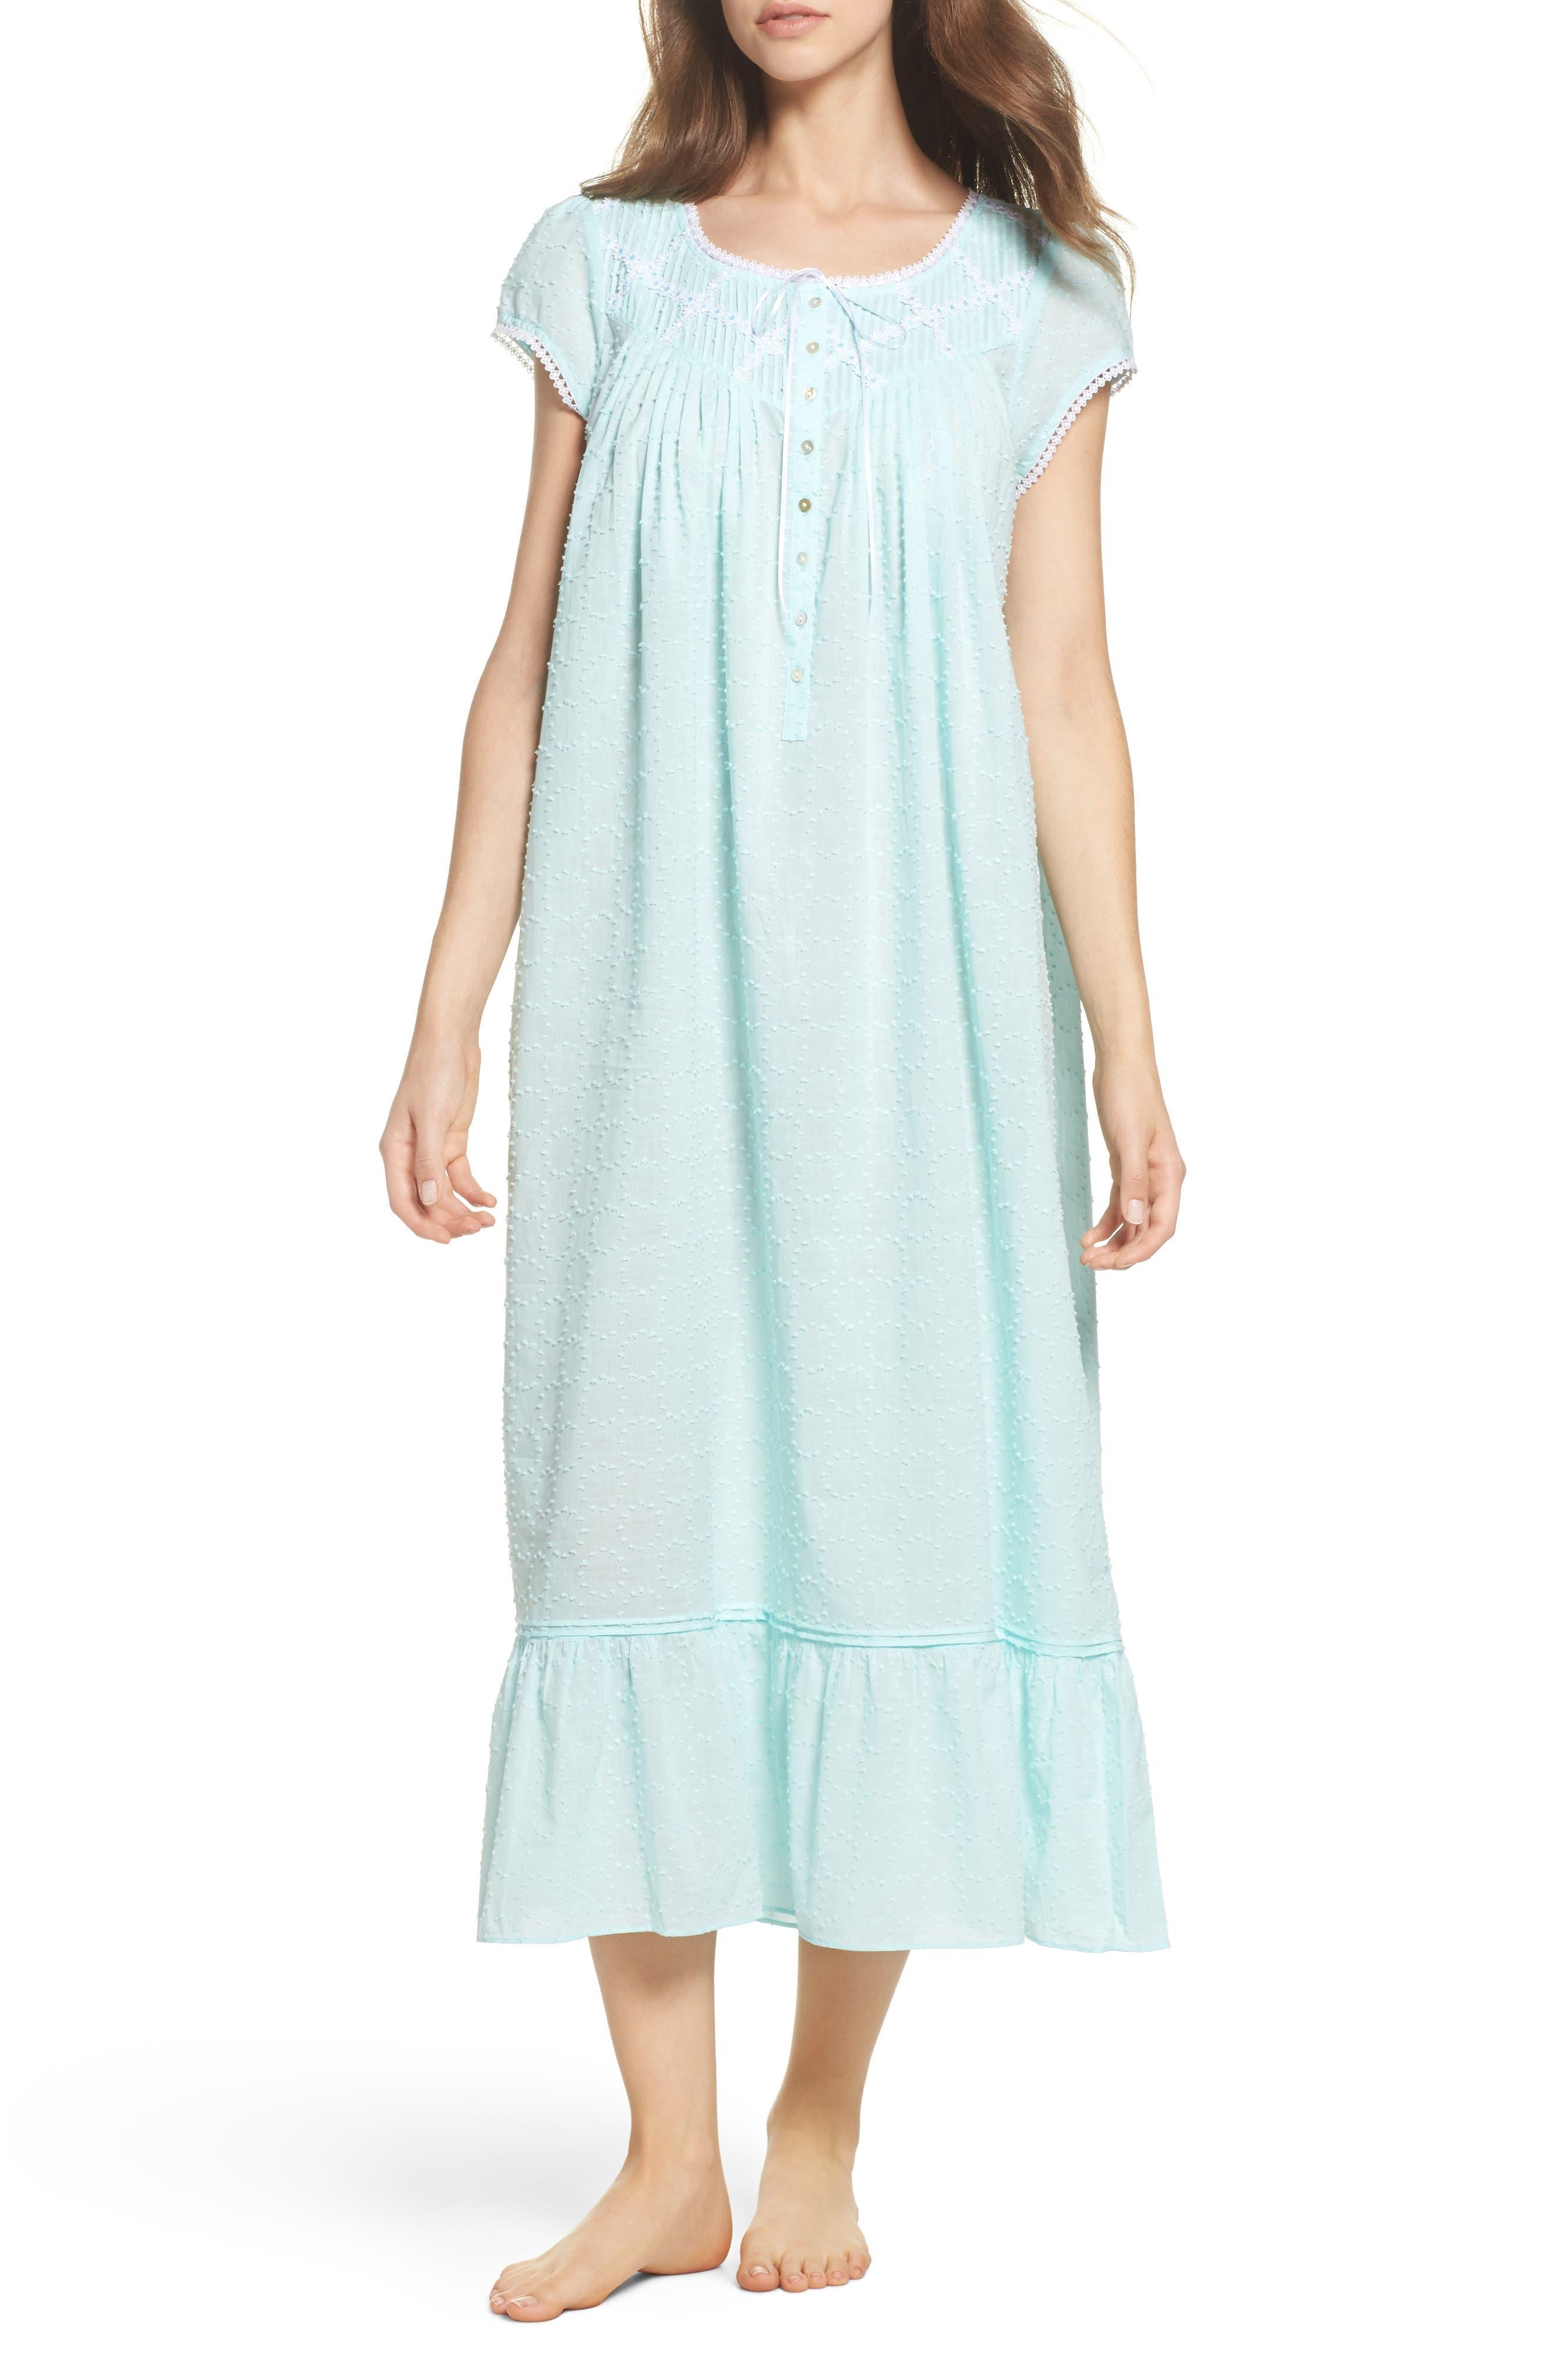 Cotton Ballet Nightgown,                         Main,                         color, 400